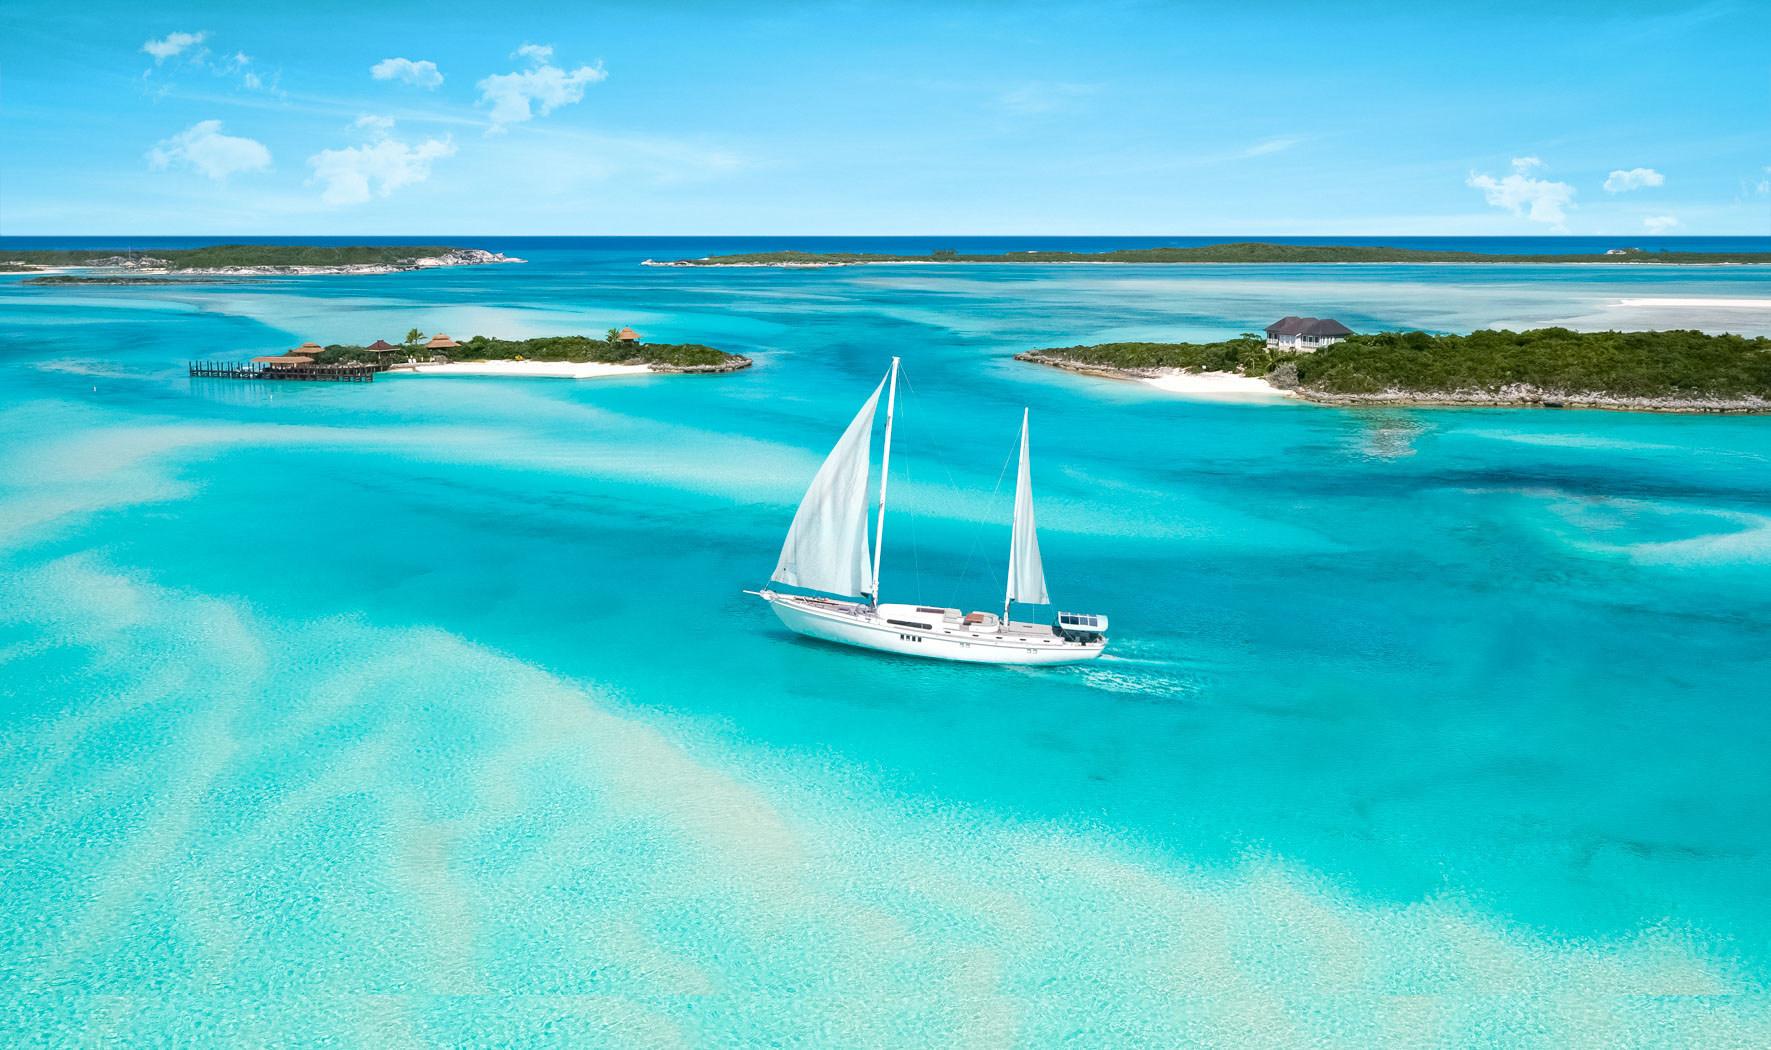 Bahamas Ministry of Tourism & Aviation